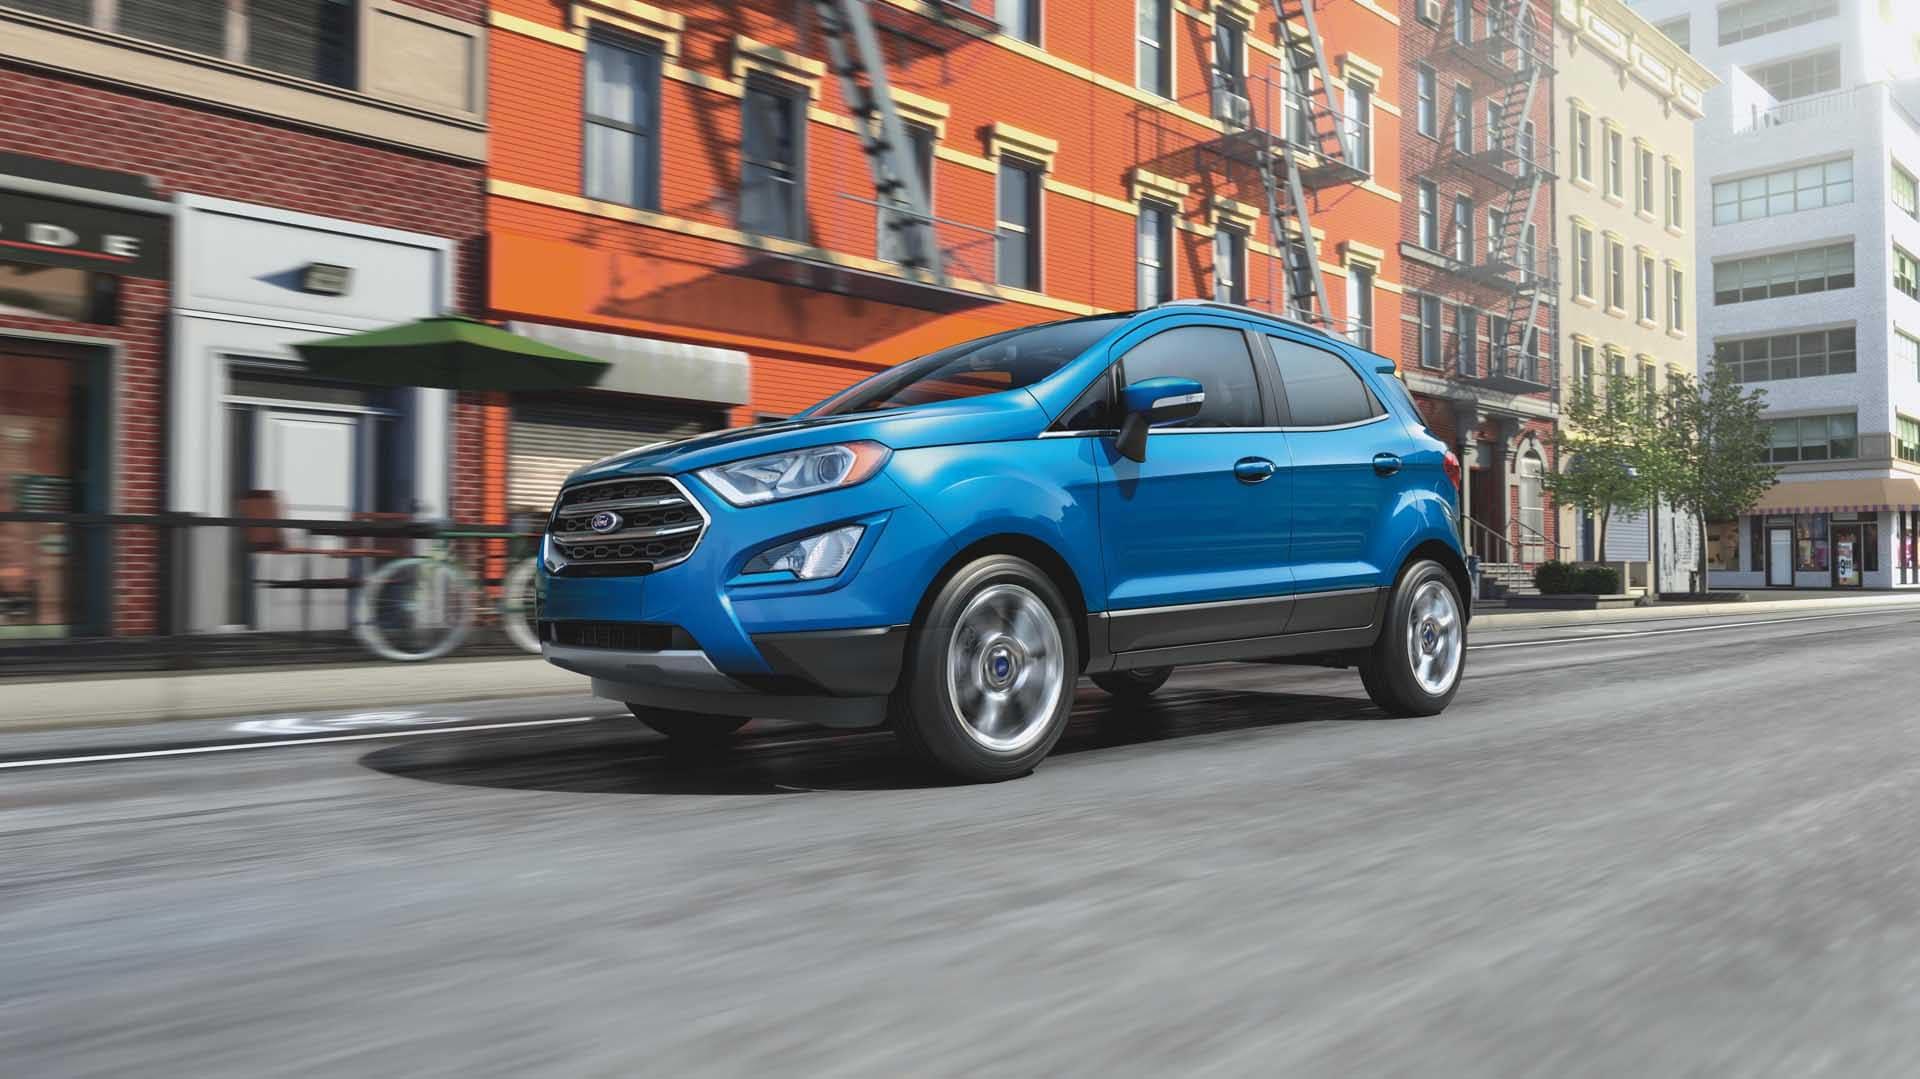 2021 Ford EcoSport Accessories